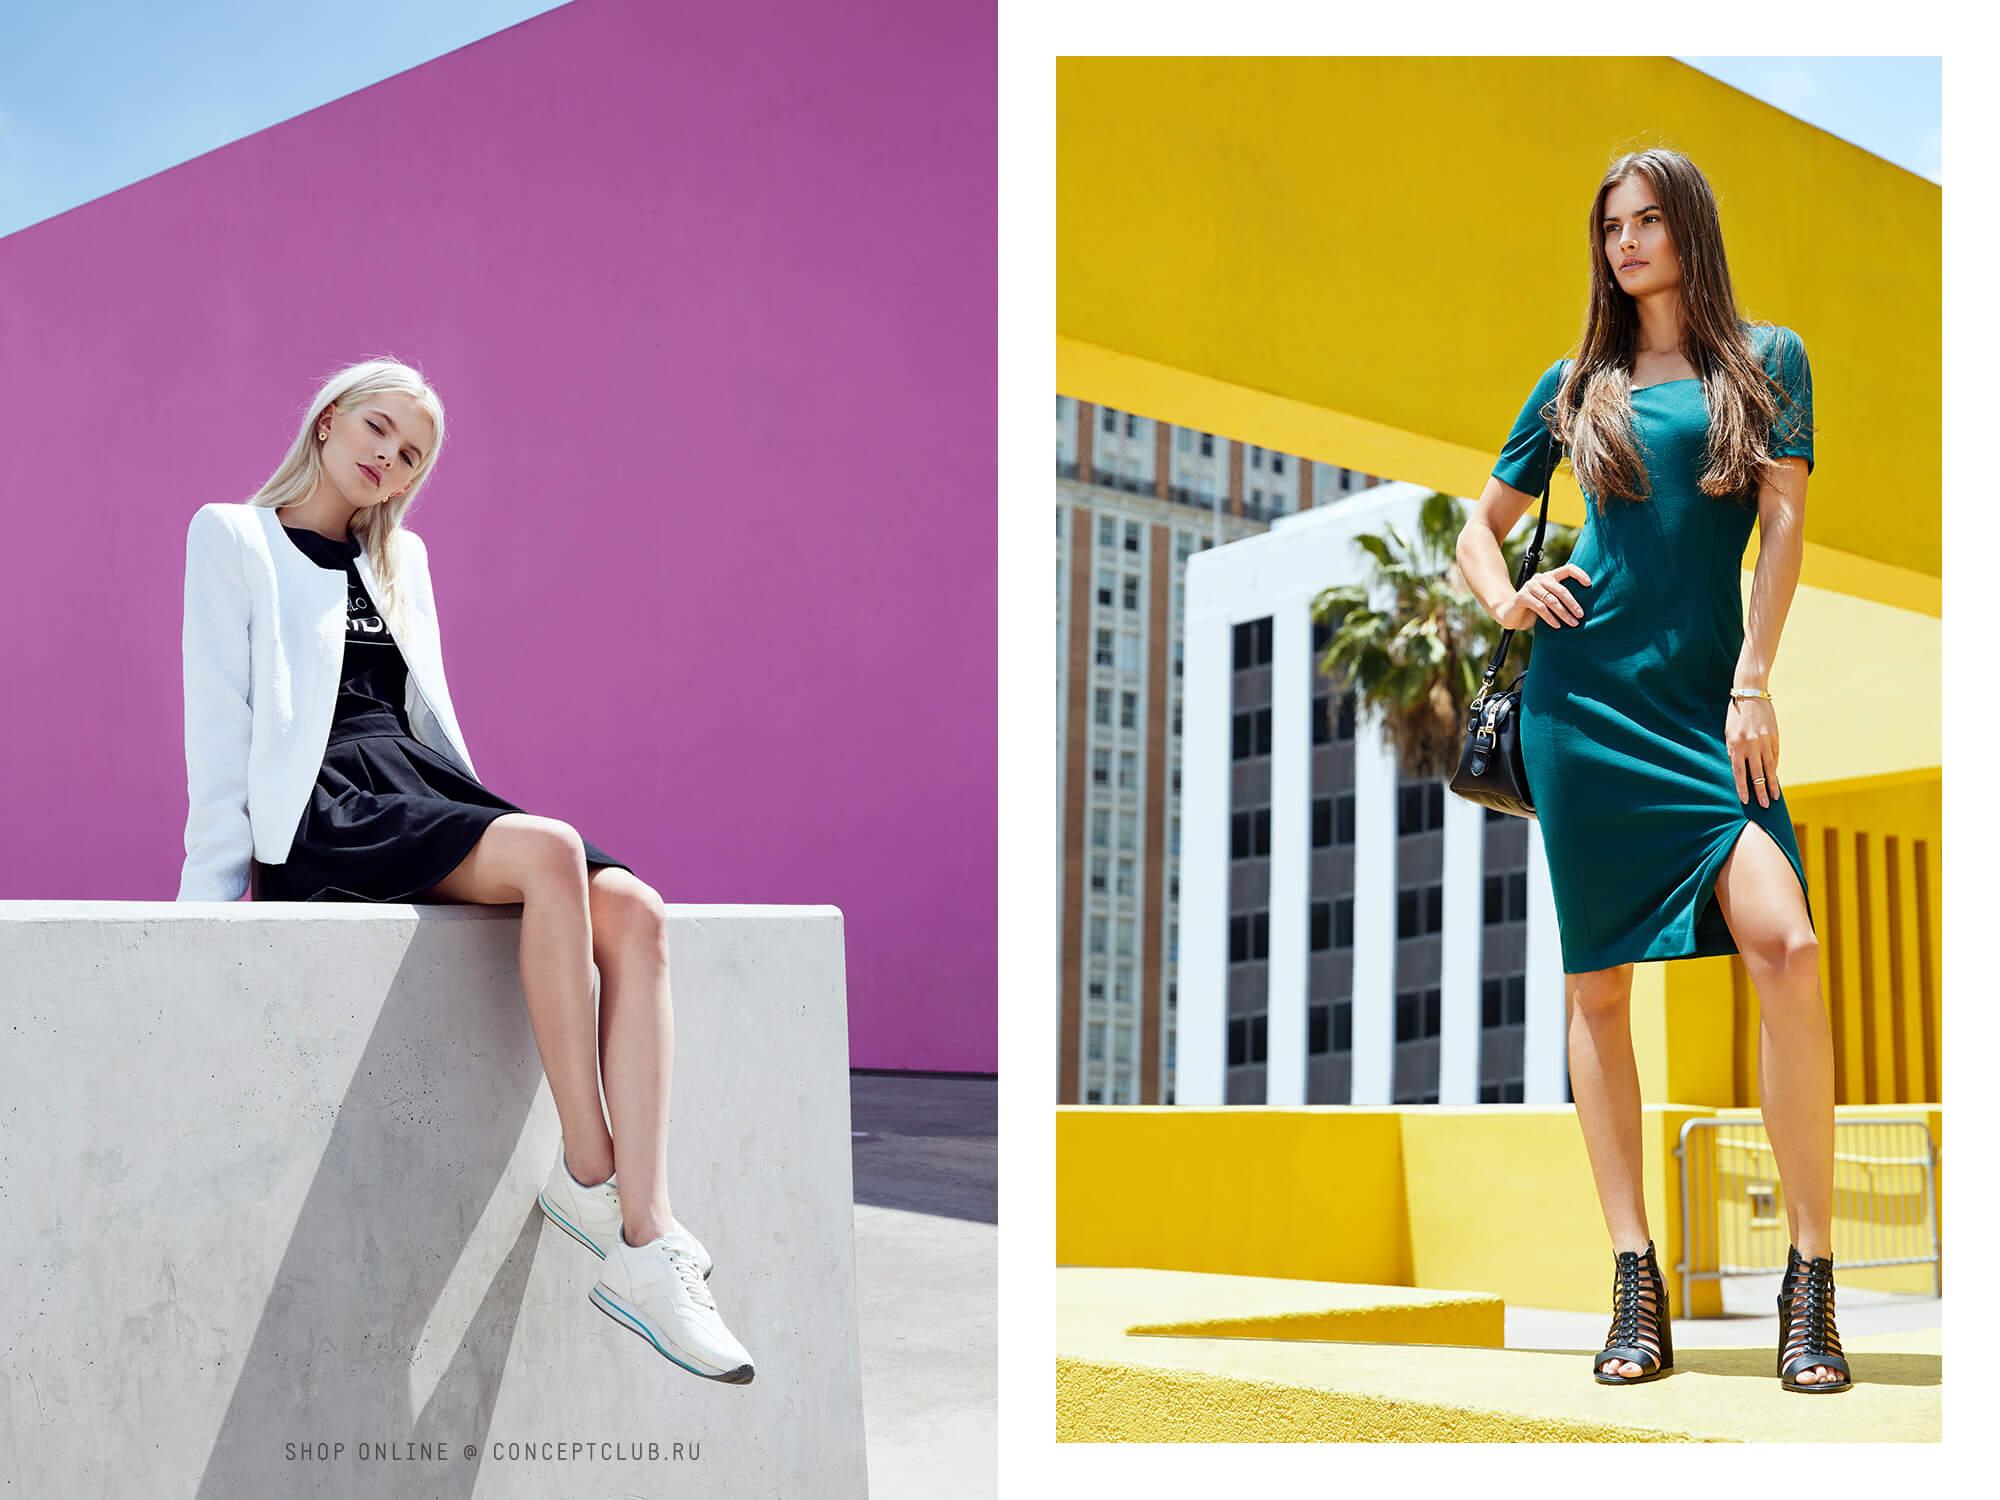 ЕВГЕНИЯ ВОРОНОВА – Concept Club Campaign SS'15 – EVGENIA VORONOVA